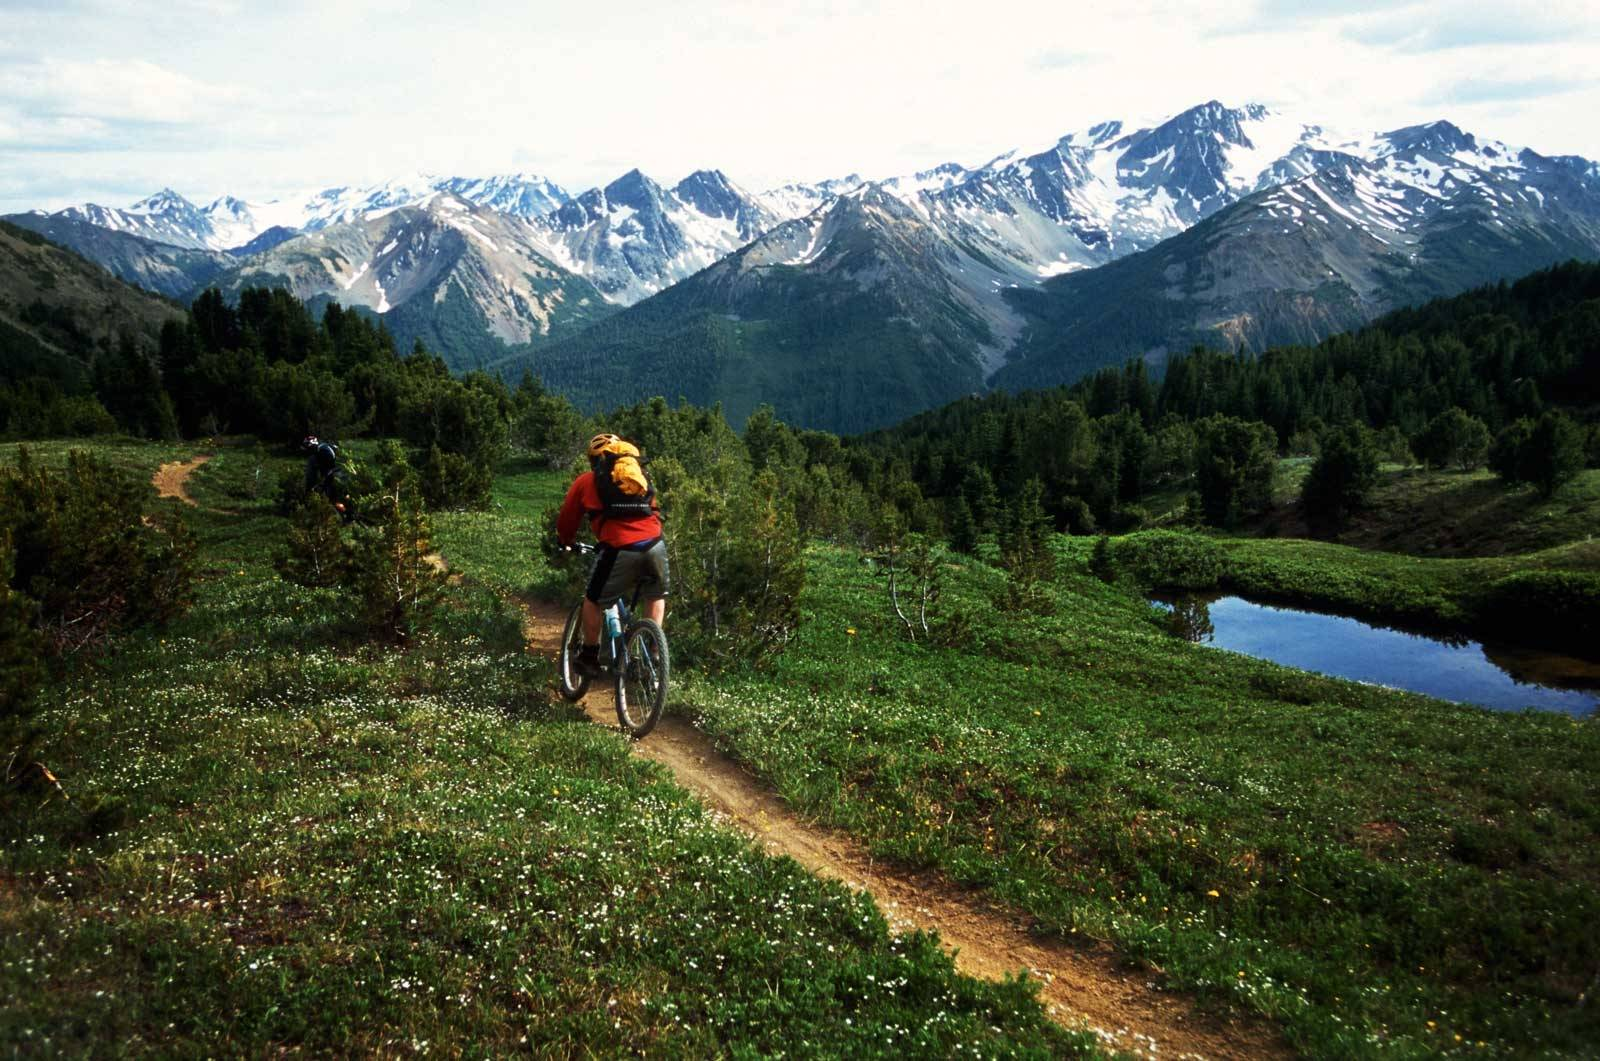 Stisykling-guide-British-Columbia-Chilcotin-Mountains-1